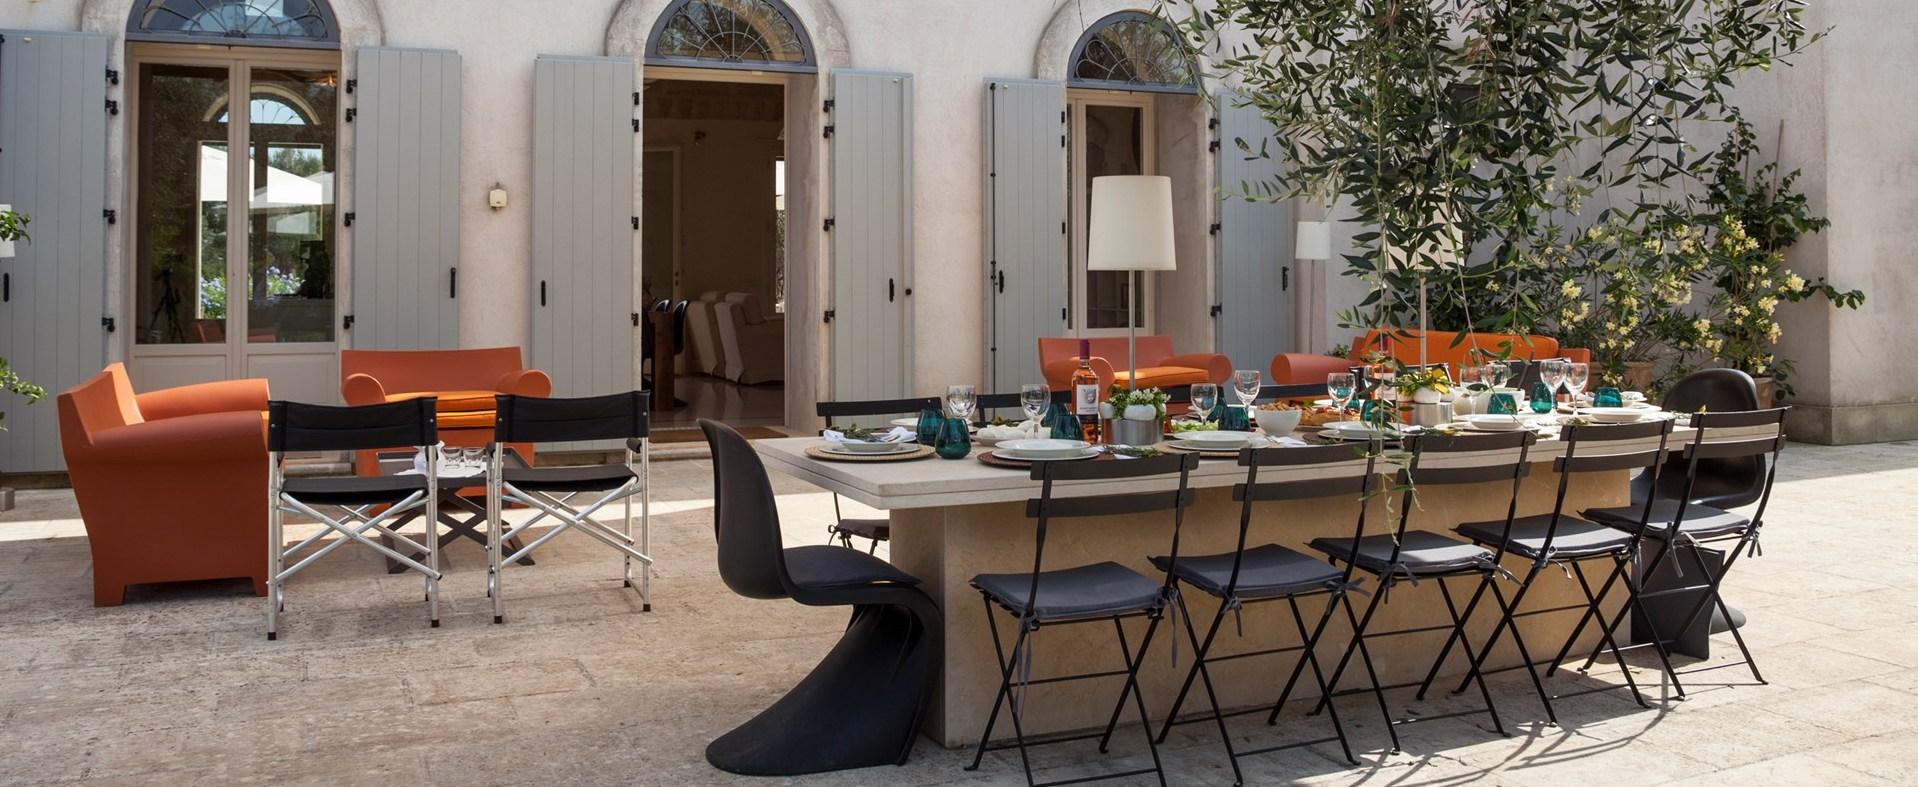 villa-tre-ulivi-al-fresco-dining